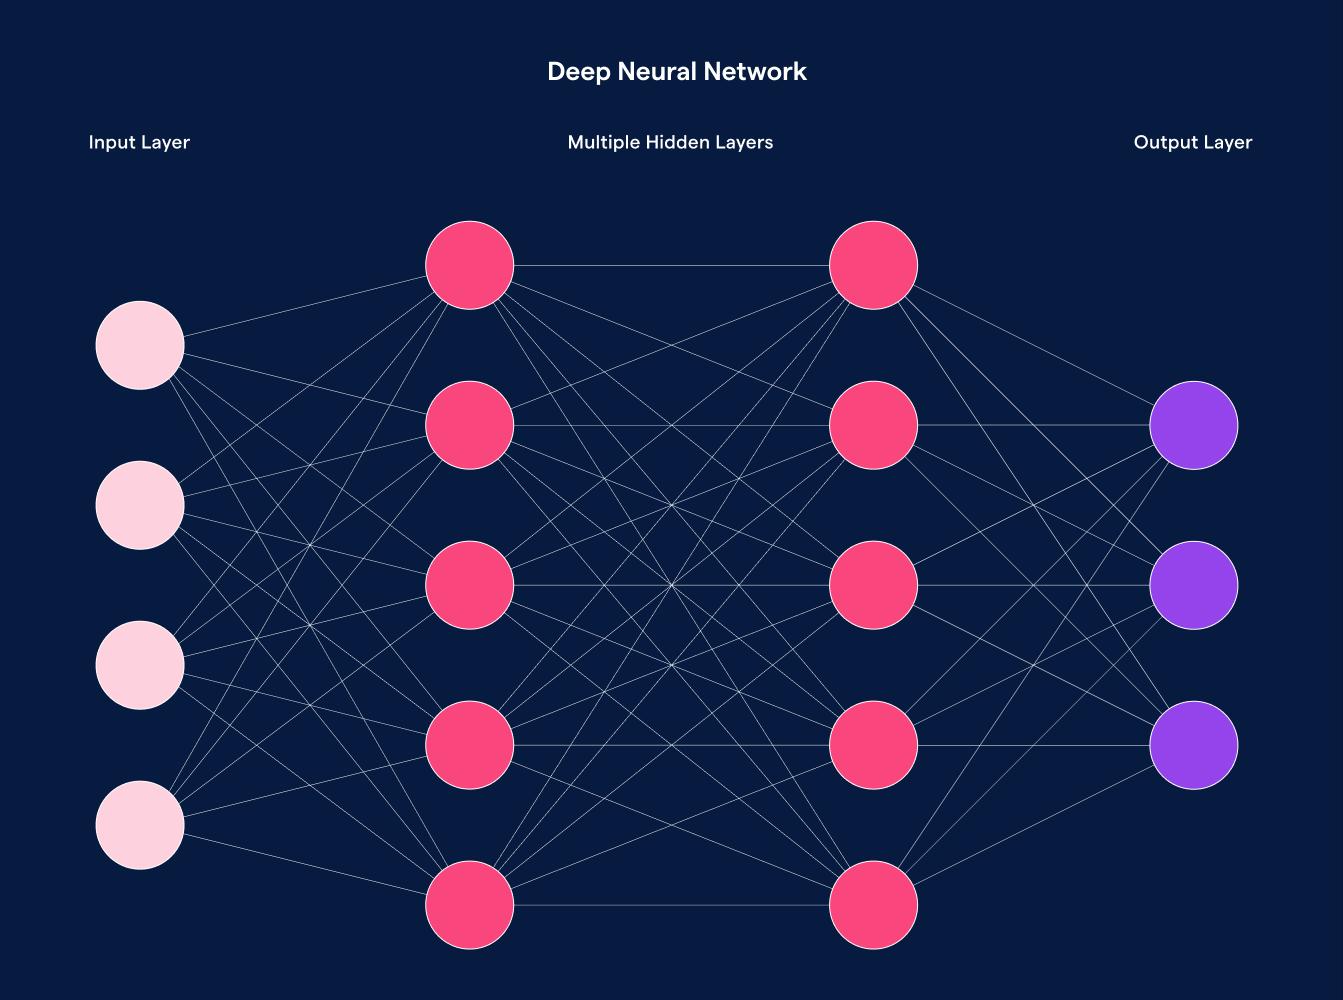 Nodes in a neural network.